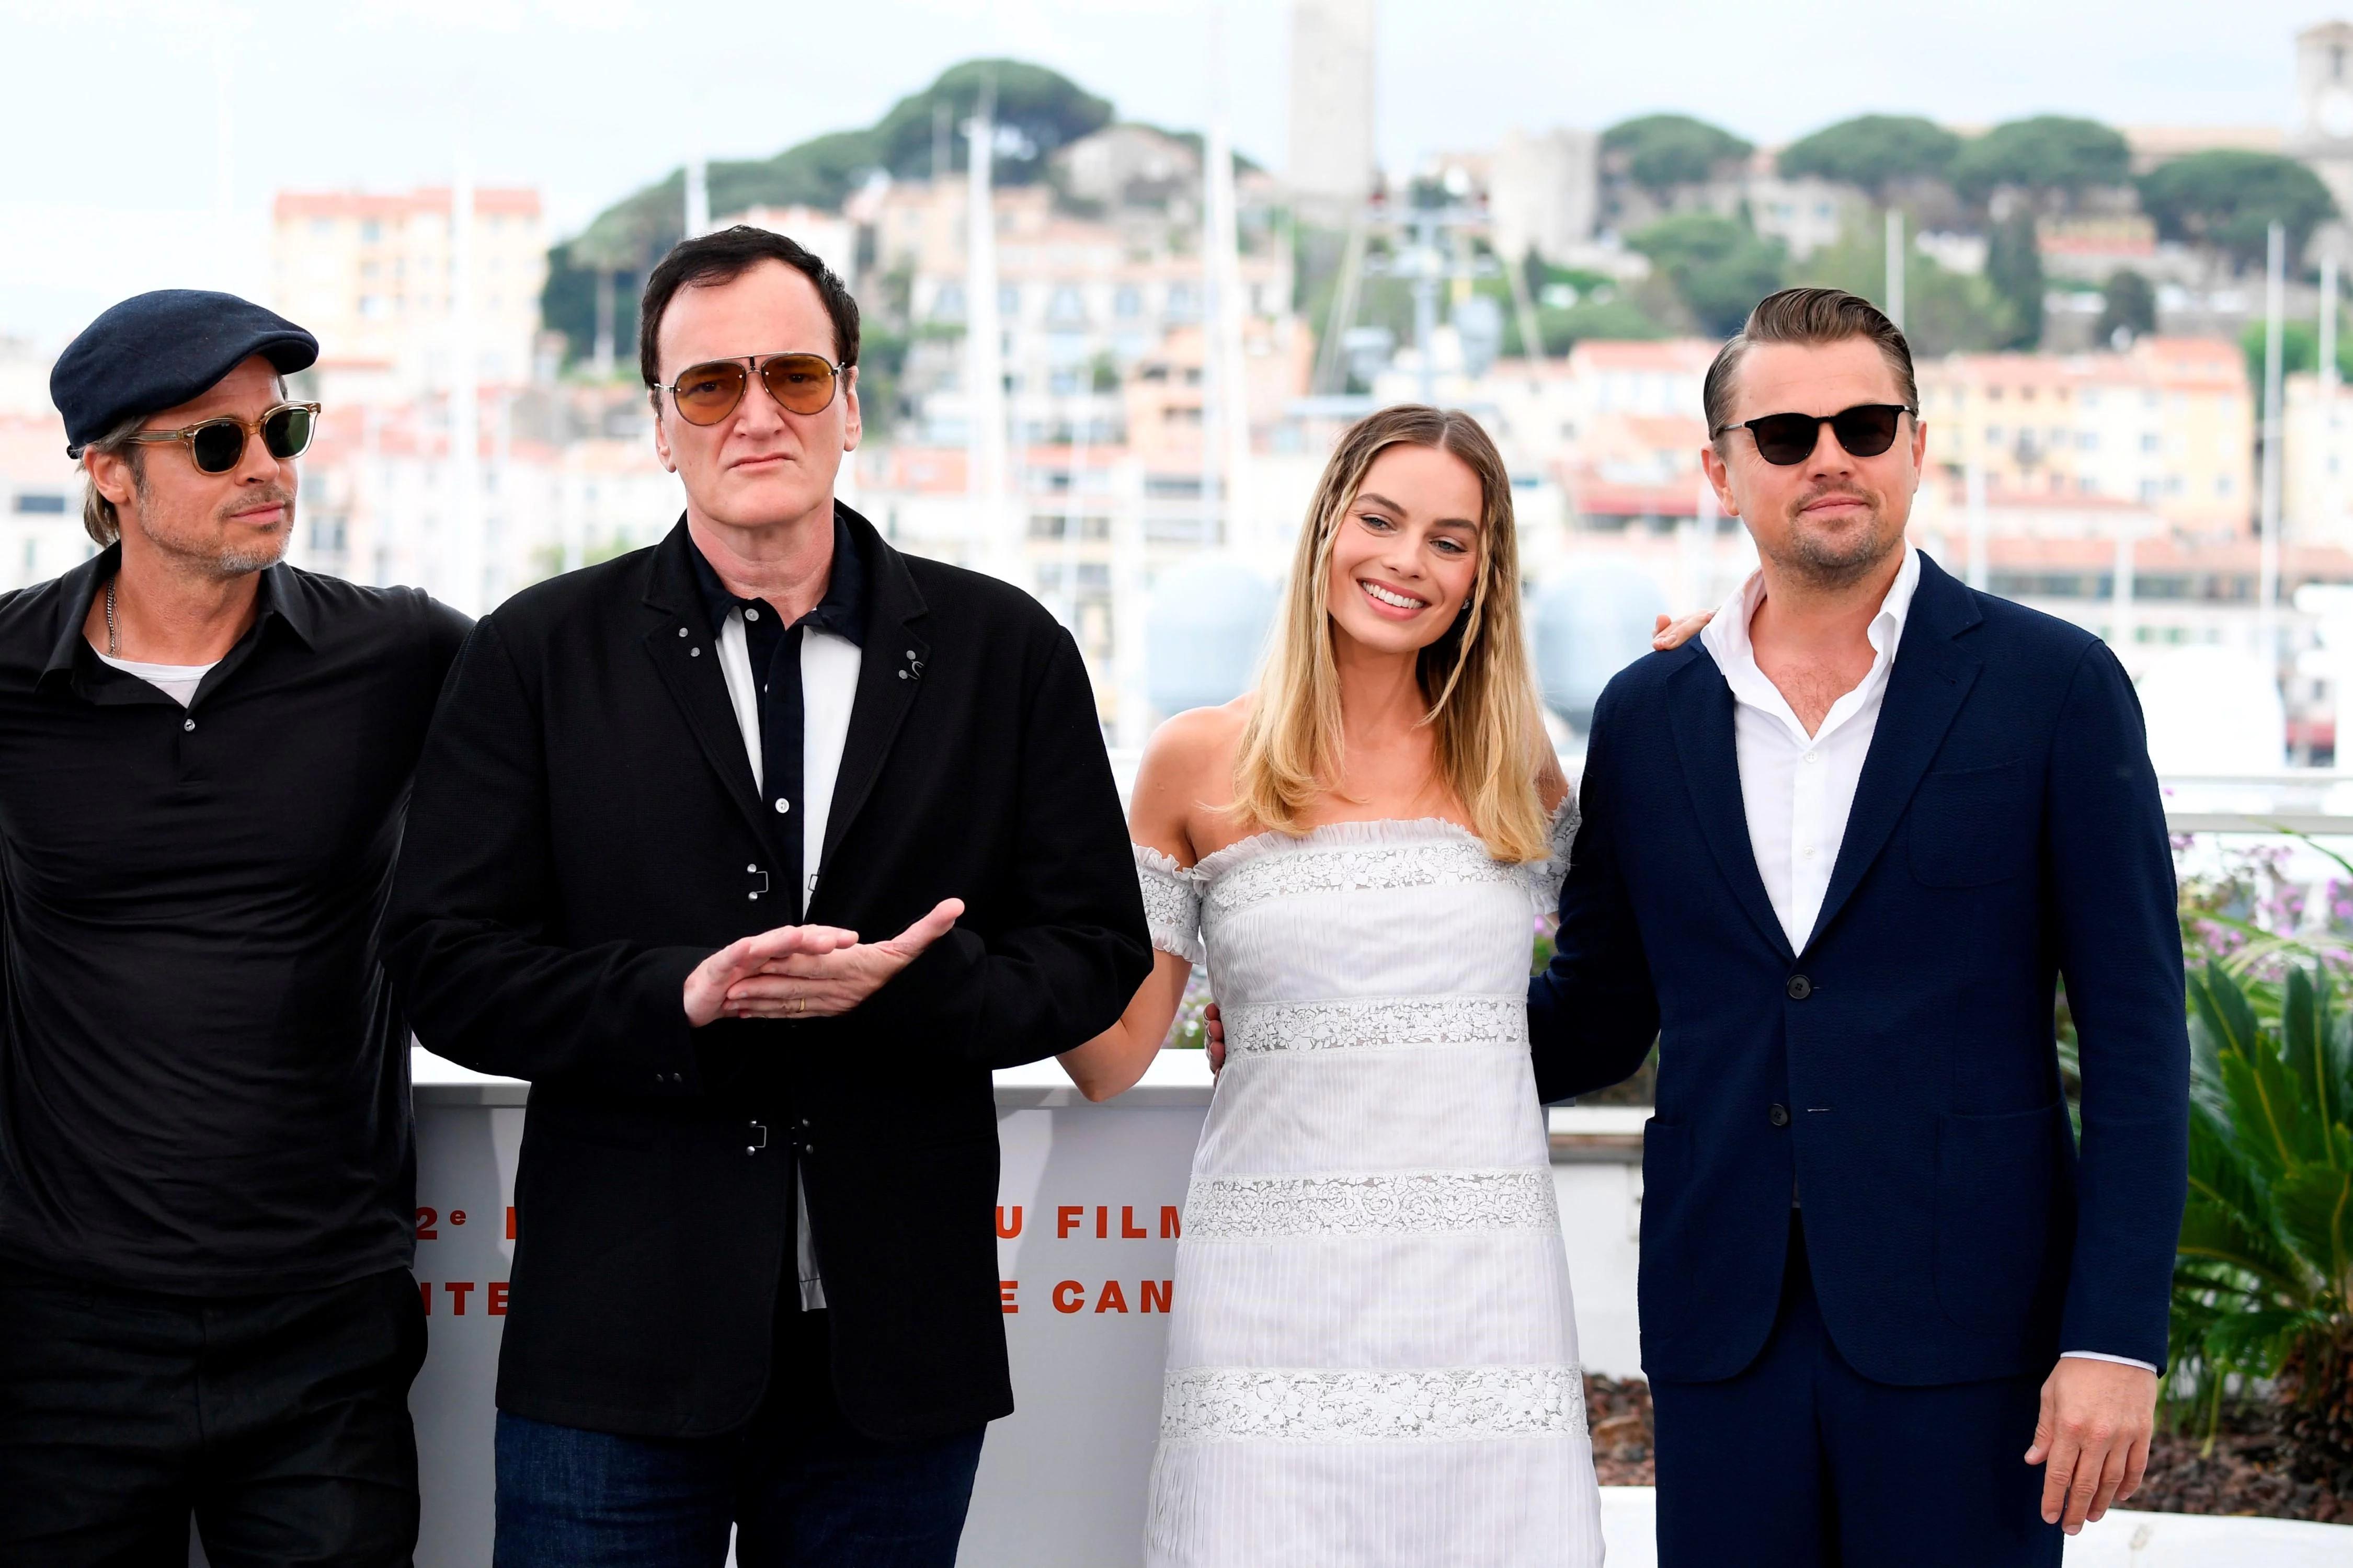 Once Upon a Time in Hollywood de Tarantino conquista Cannes y la crítica